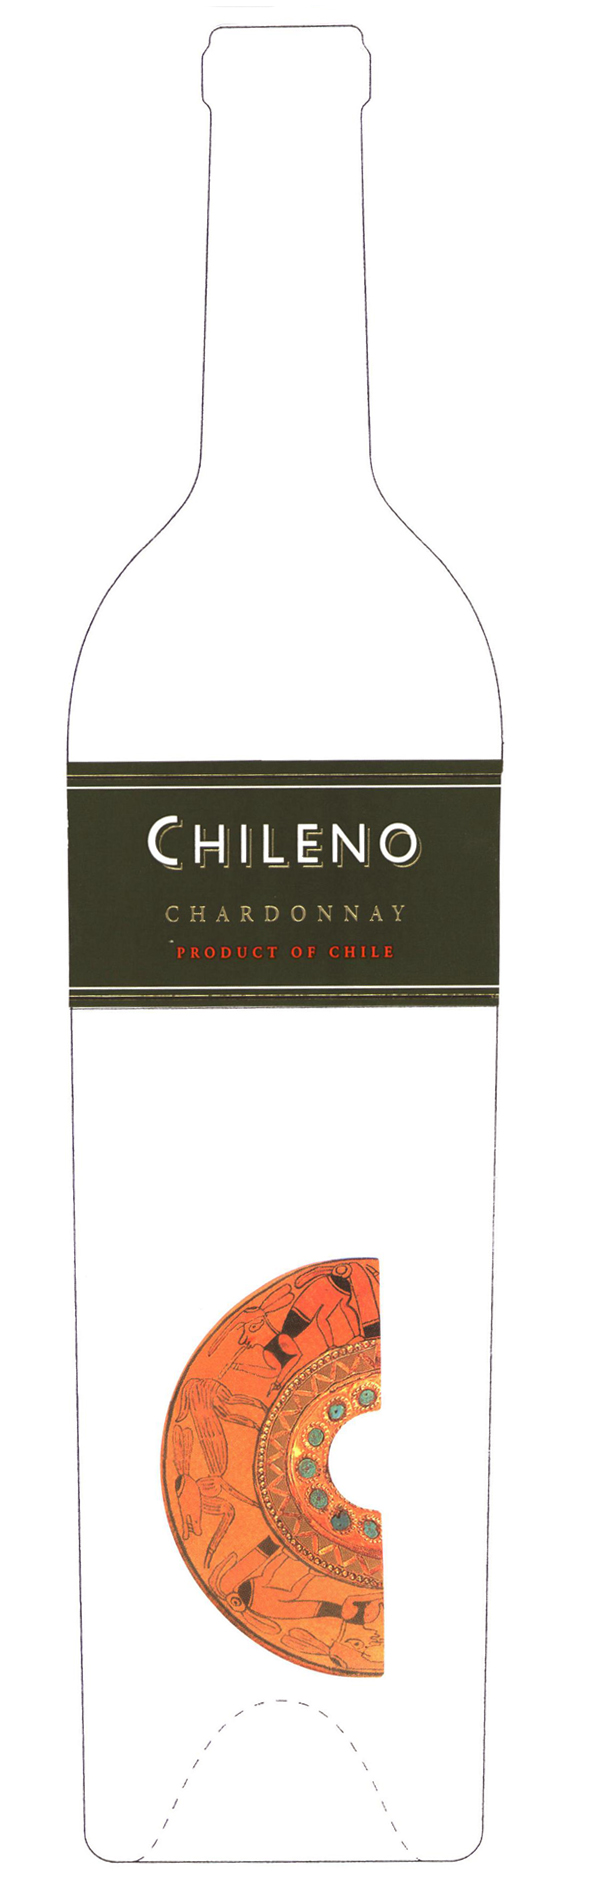 CHILENO CHARDONNAY PRODUCT OF CHILE